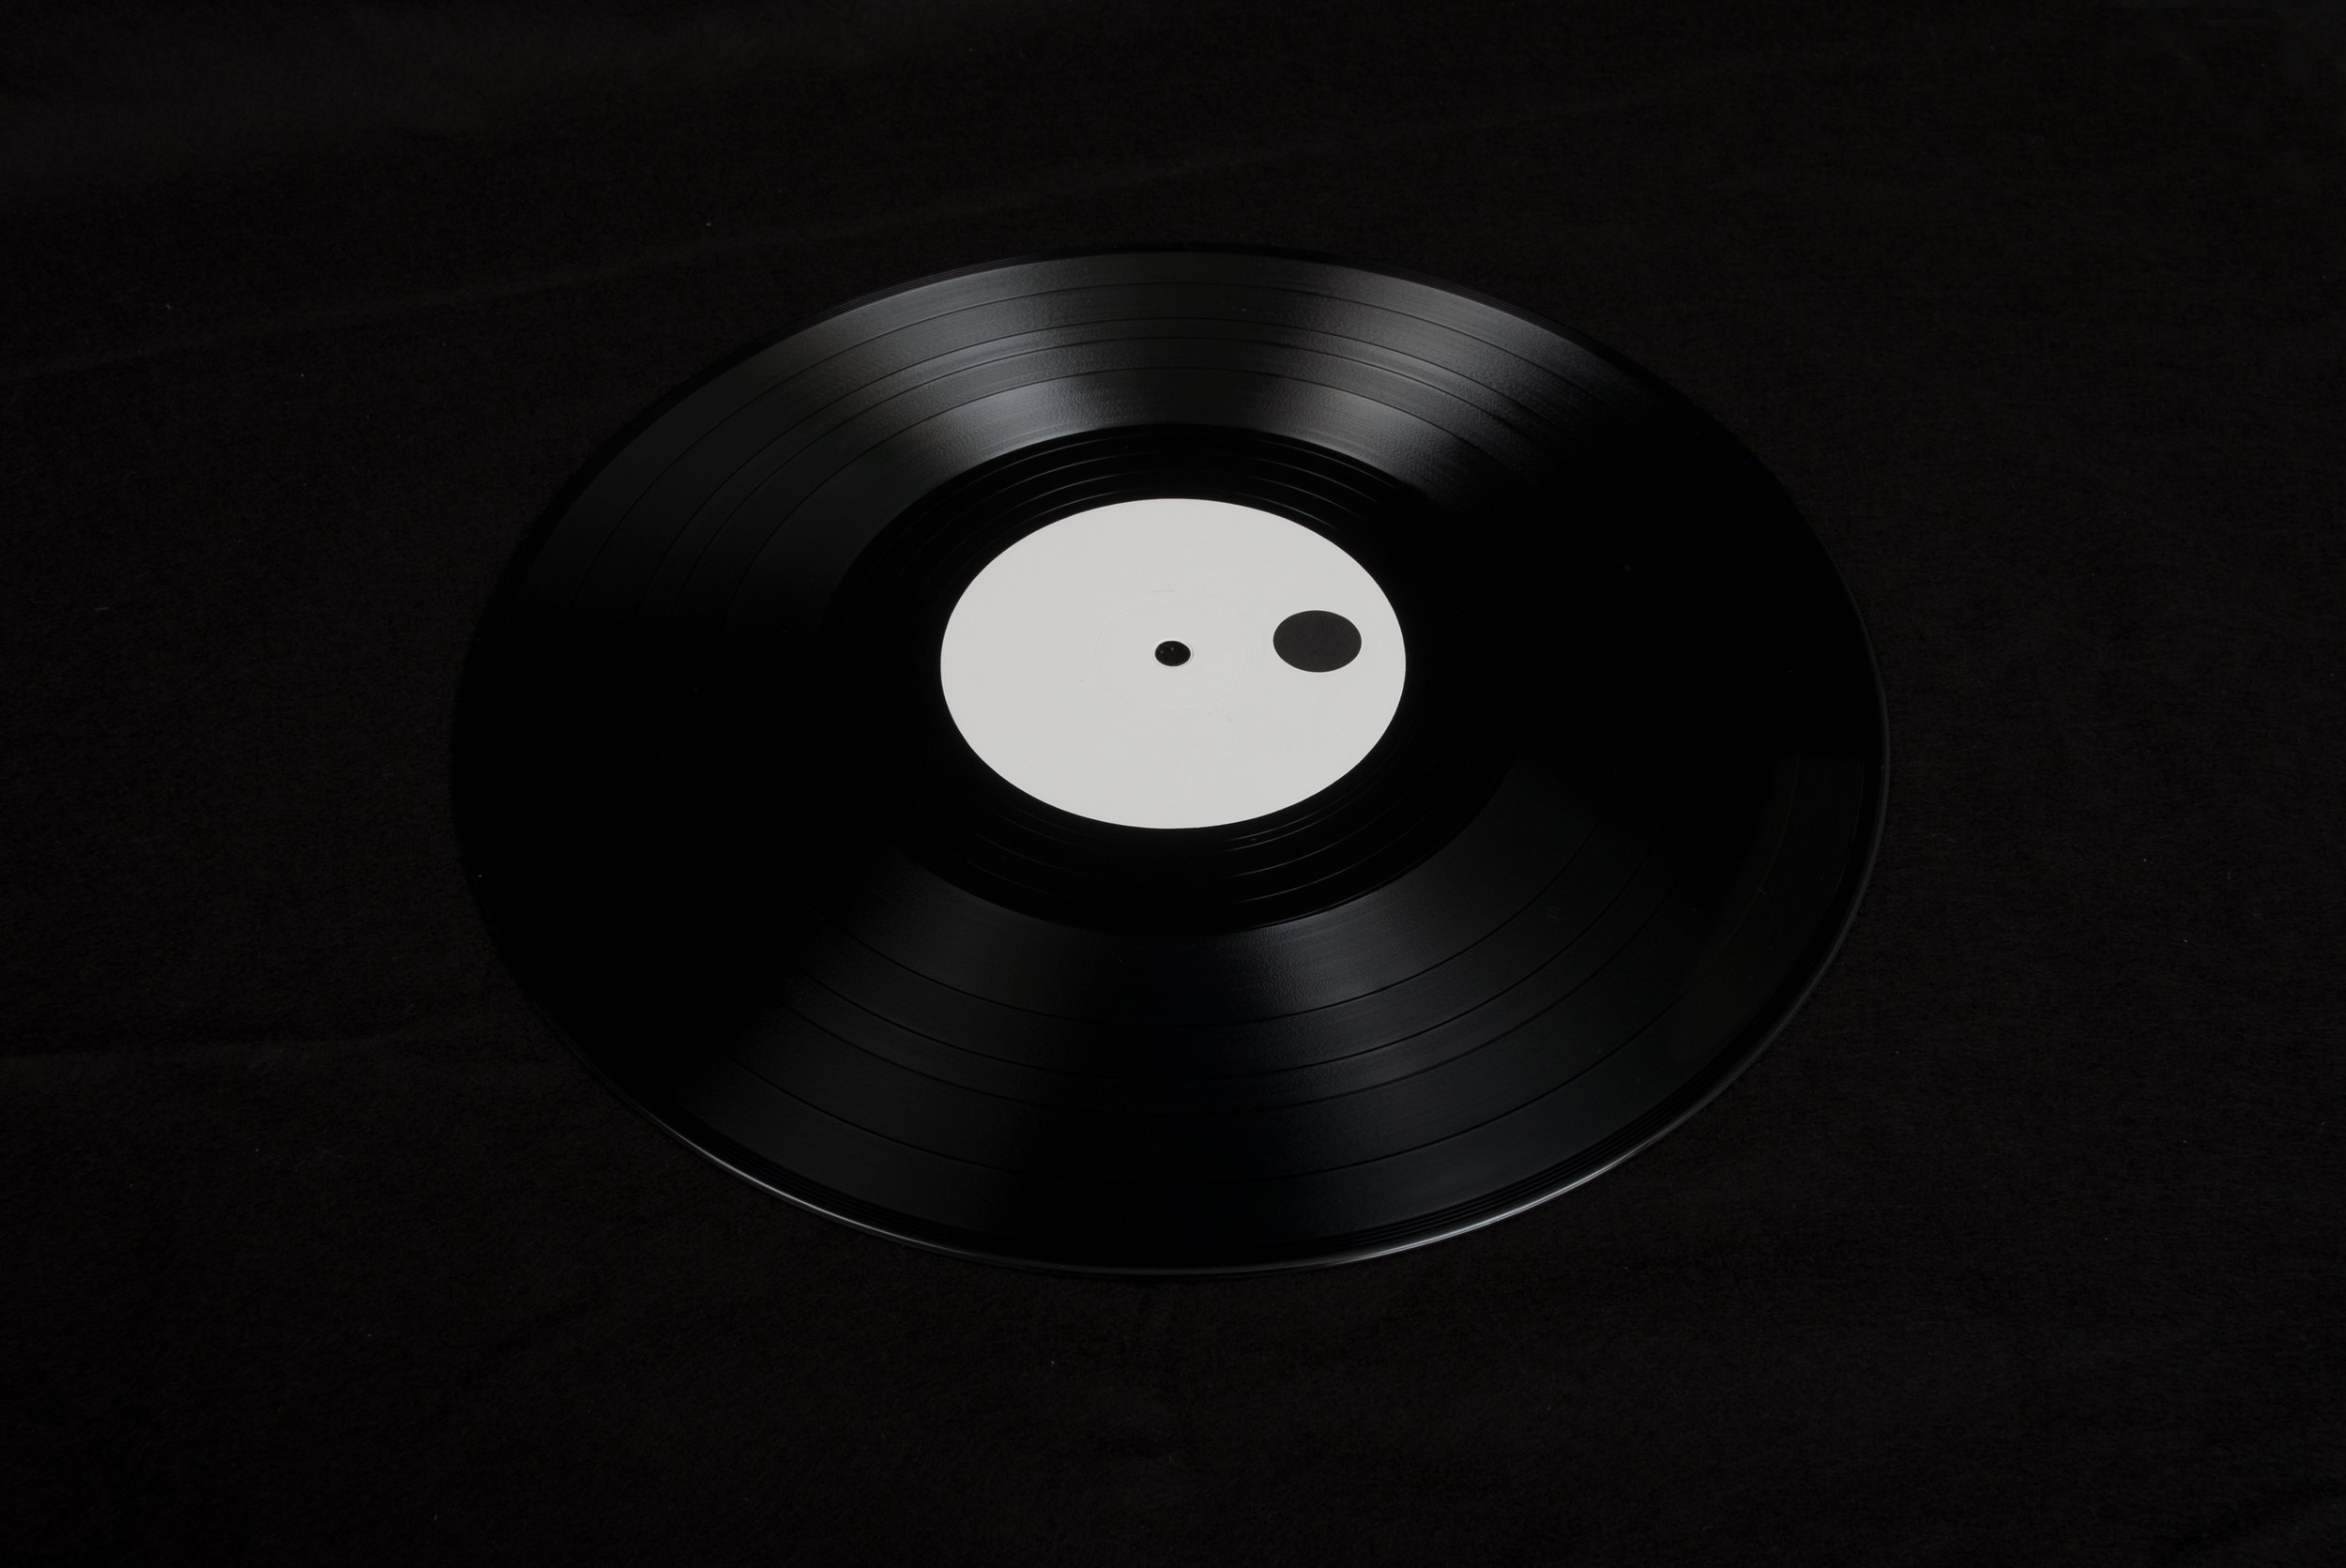 LSP-TRANS-001_record_04.jpg